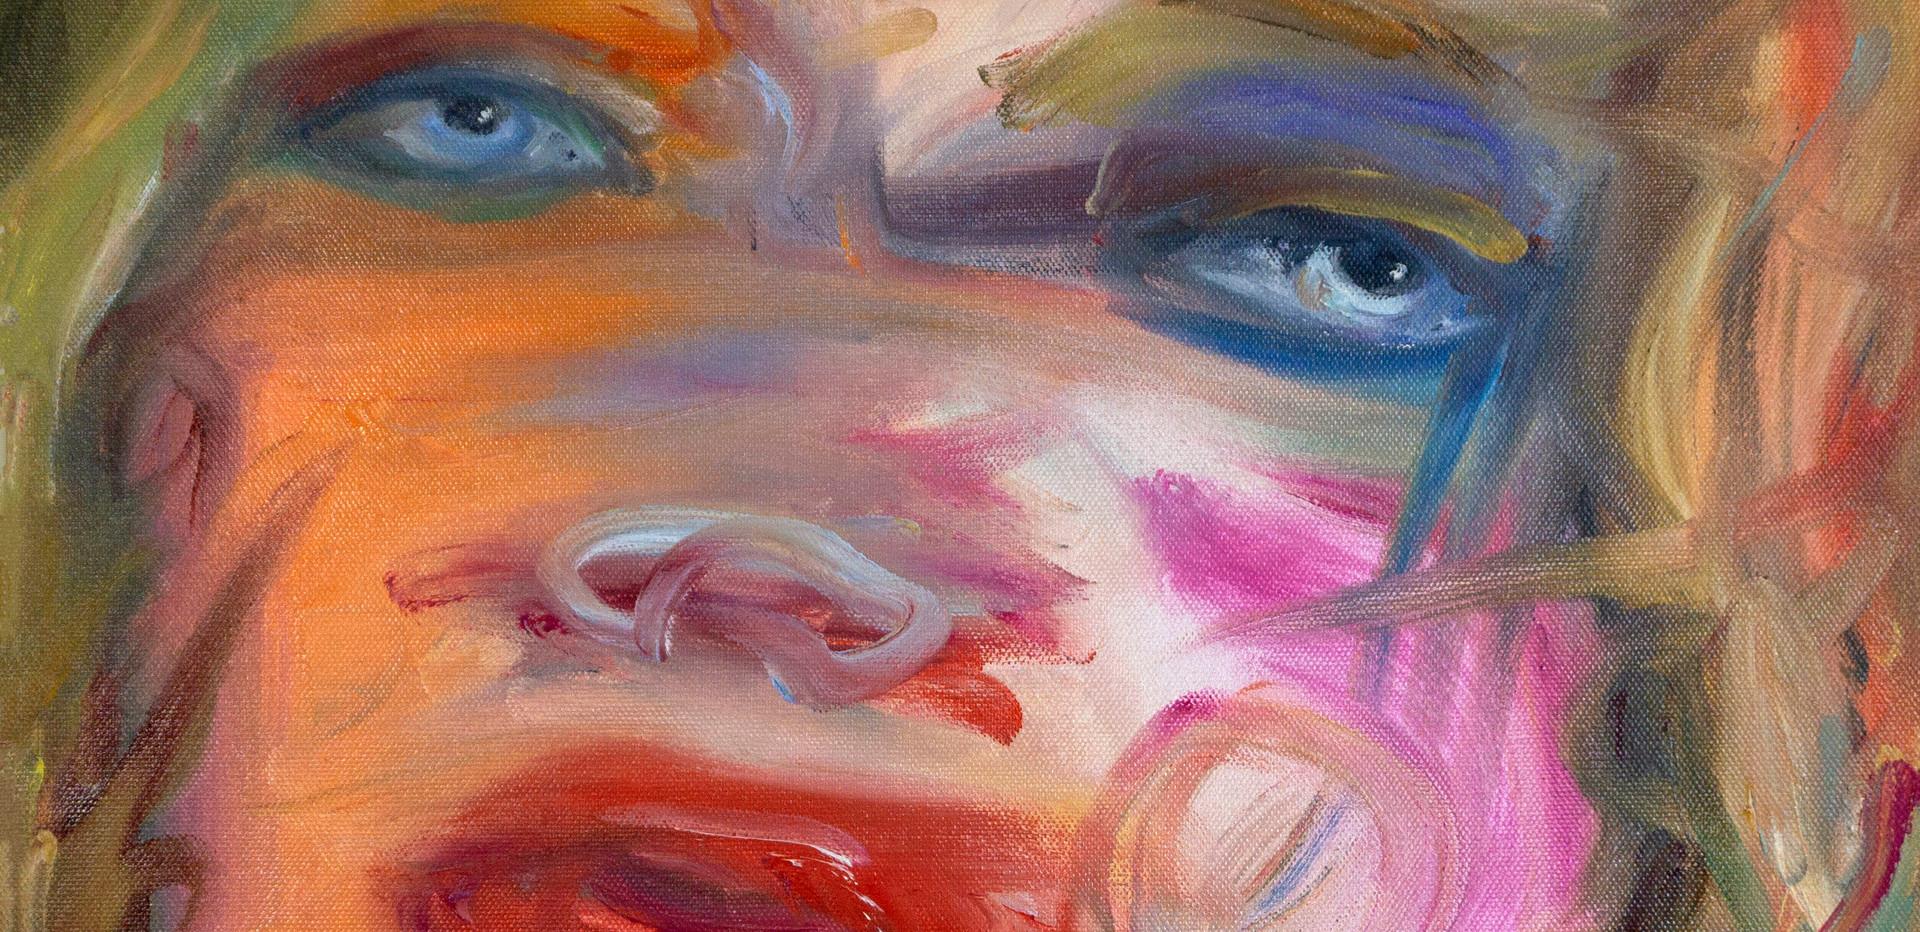 Maria Petrovskaya, Natalia Vodianova, 2020, oil on canvas, 18 x 18 inches